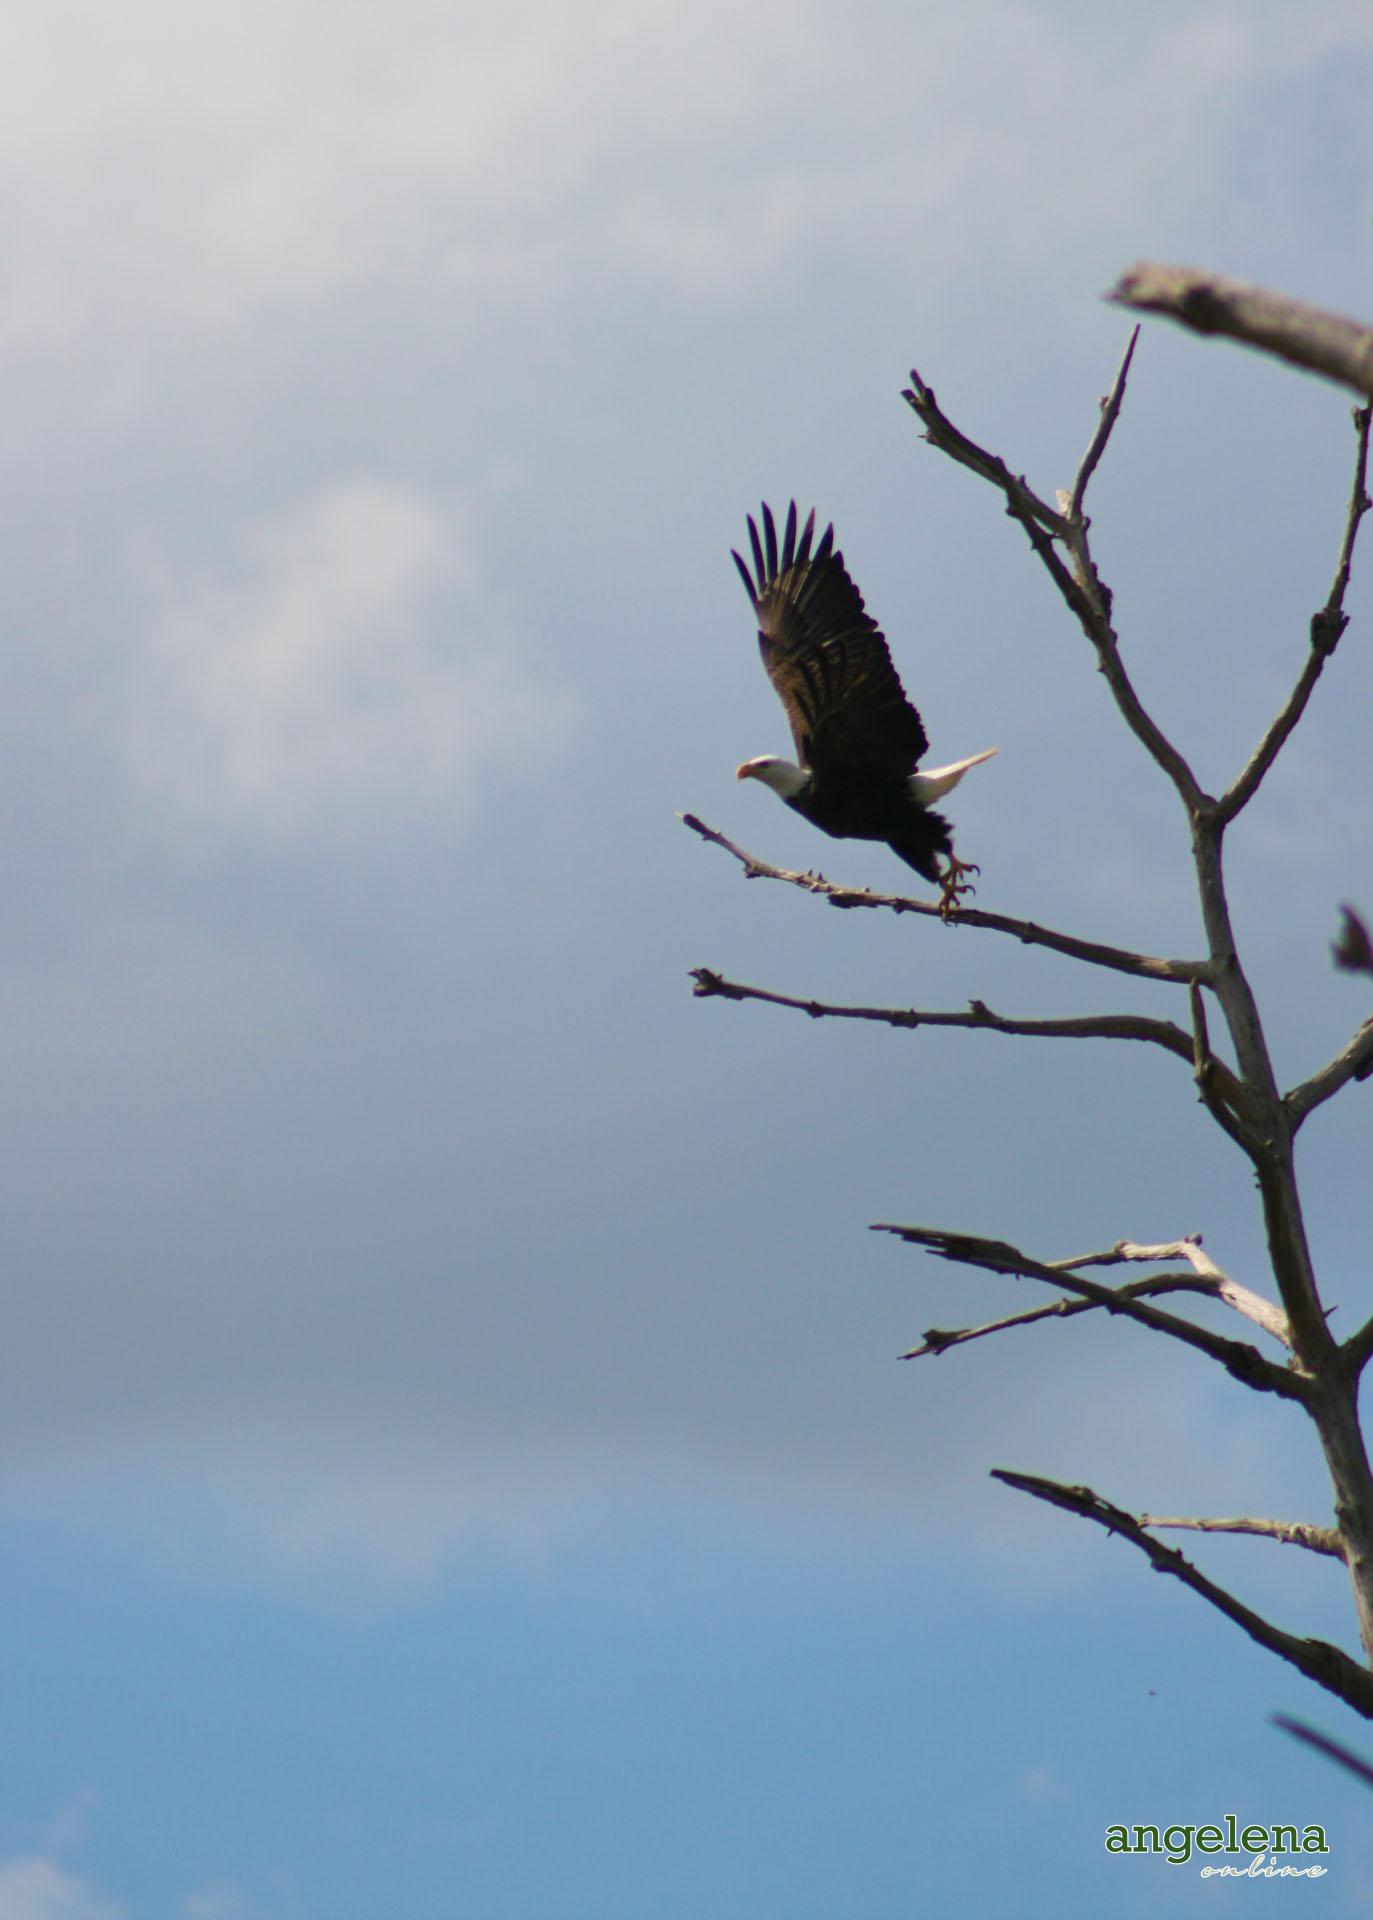 American Eagle Florida